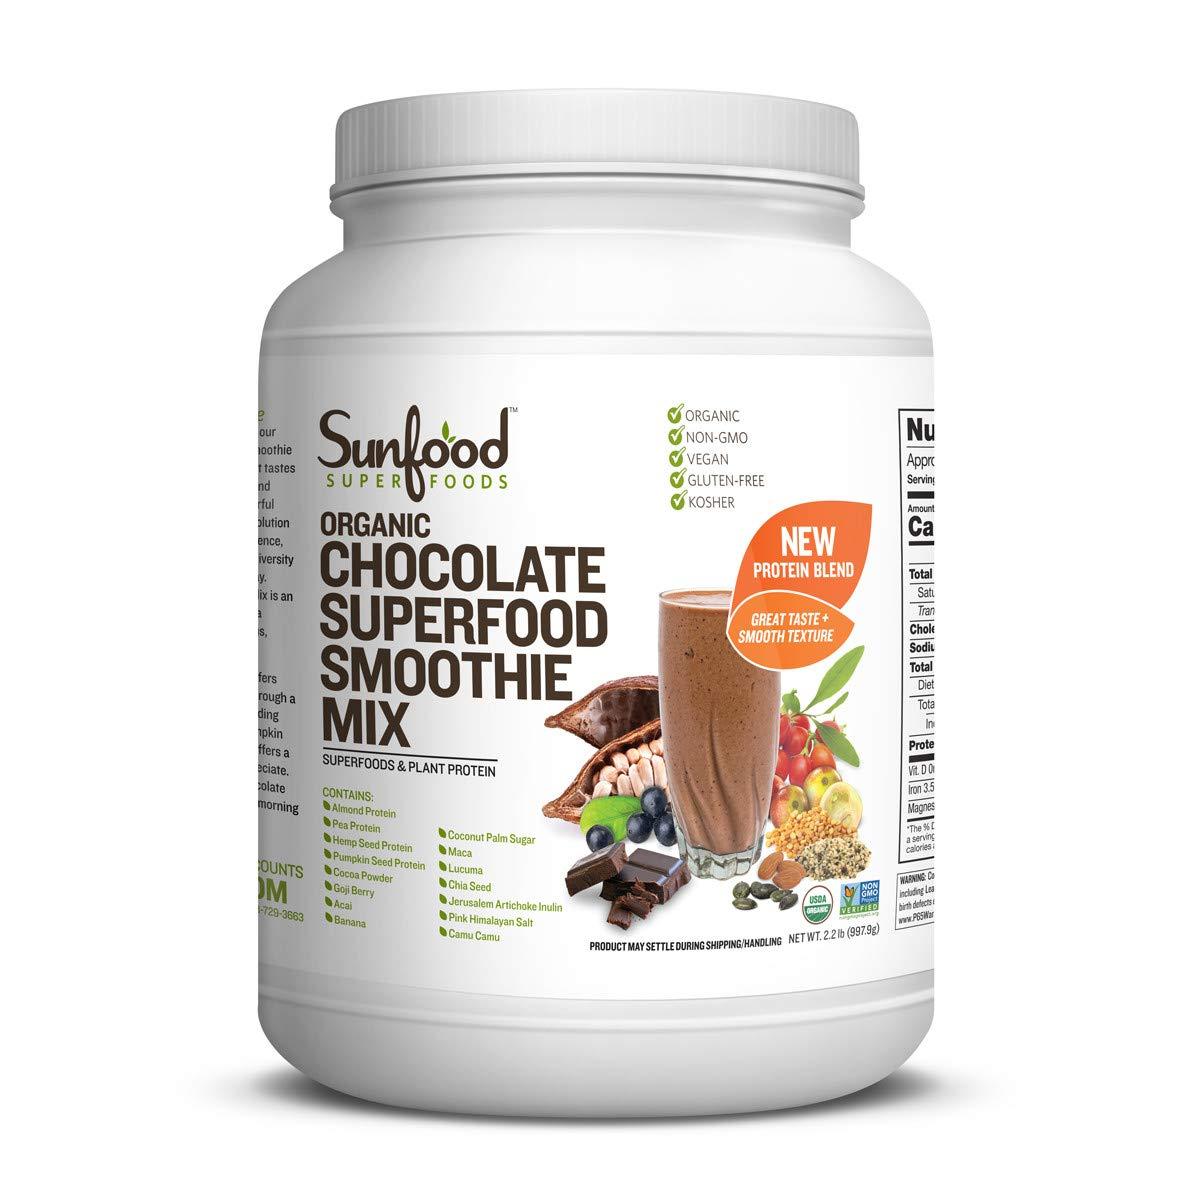 Sunfood Chocolate Superfood Smoothie Mix | New Plant-Based Protein Blend (Pea, Hemp, Almond, Pumpkin) | Highest Quality All-Natural Ingredients | Organic, Non-GMO, Vegan, Gluten Free | 2.2 lb Bulk Tub